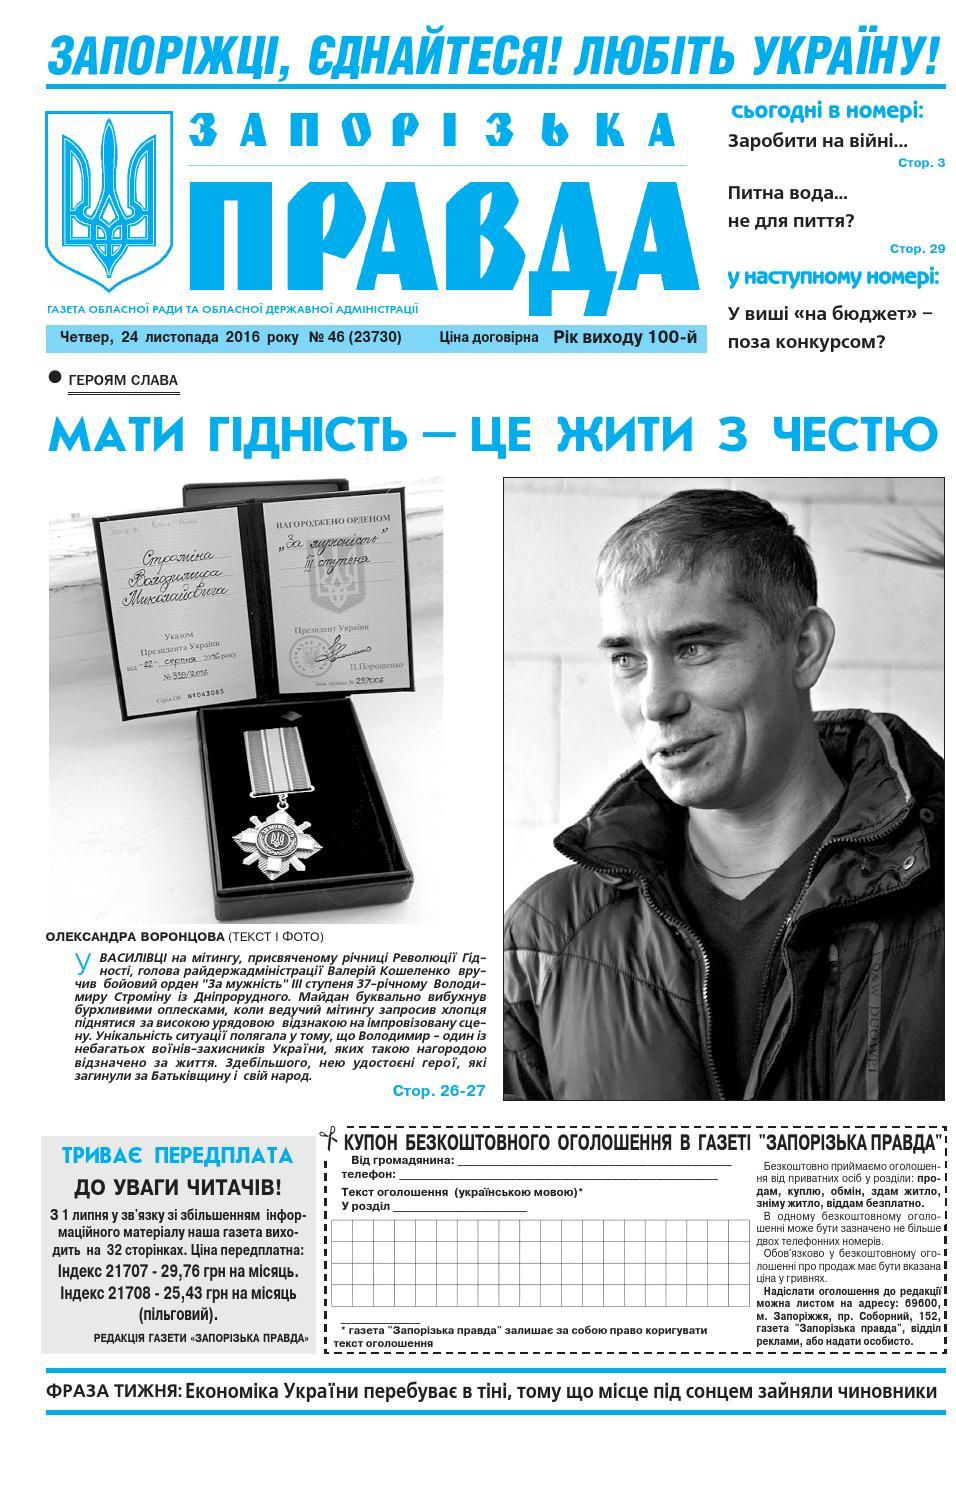 24 11 16 by Запорізька правда - issuu 6a061d8c80d1d